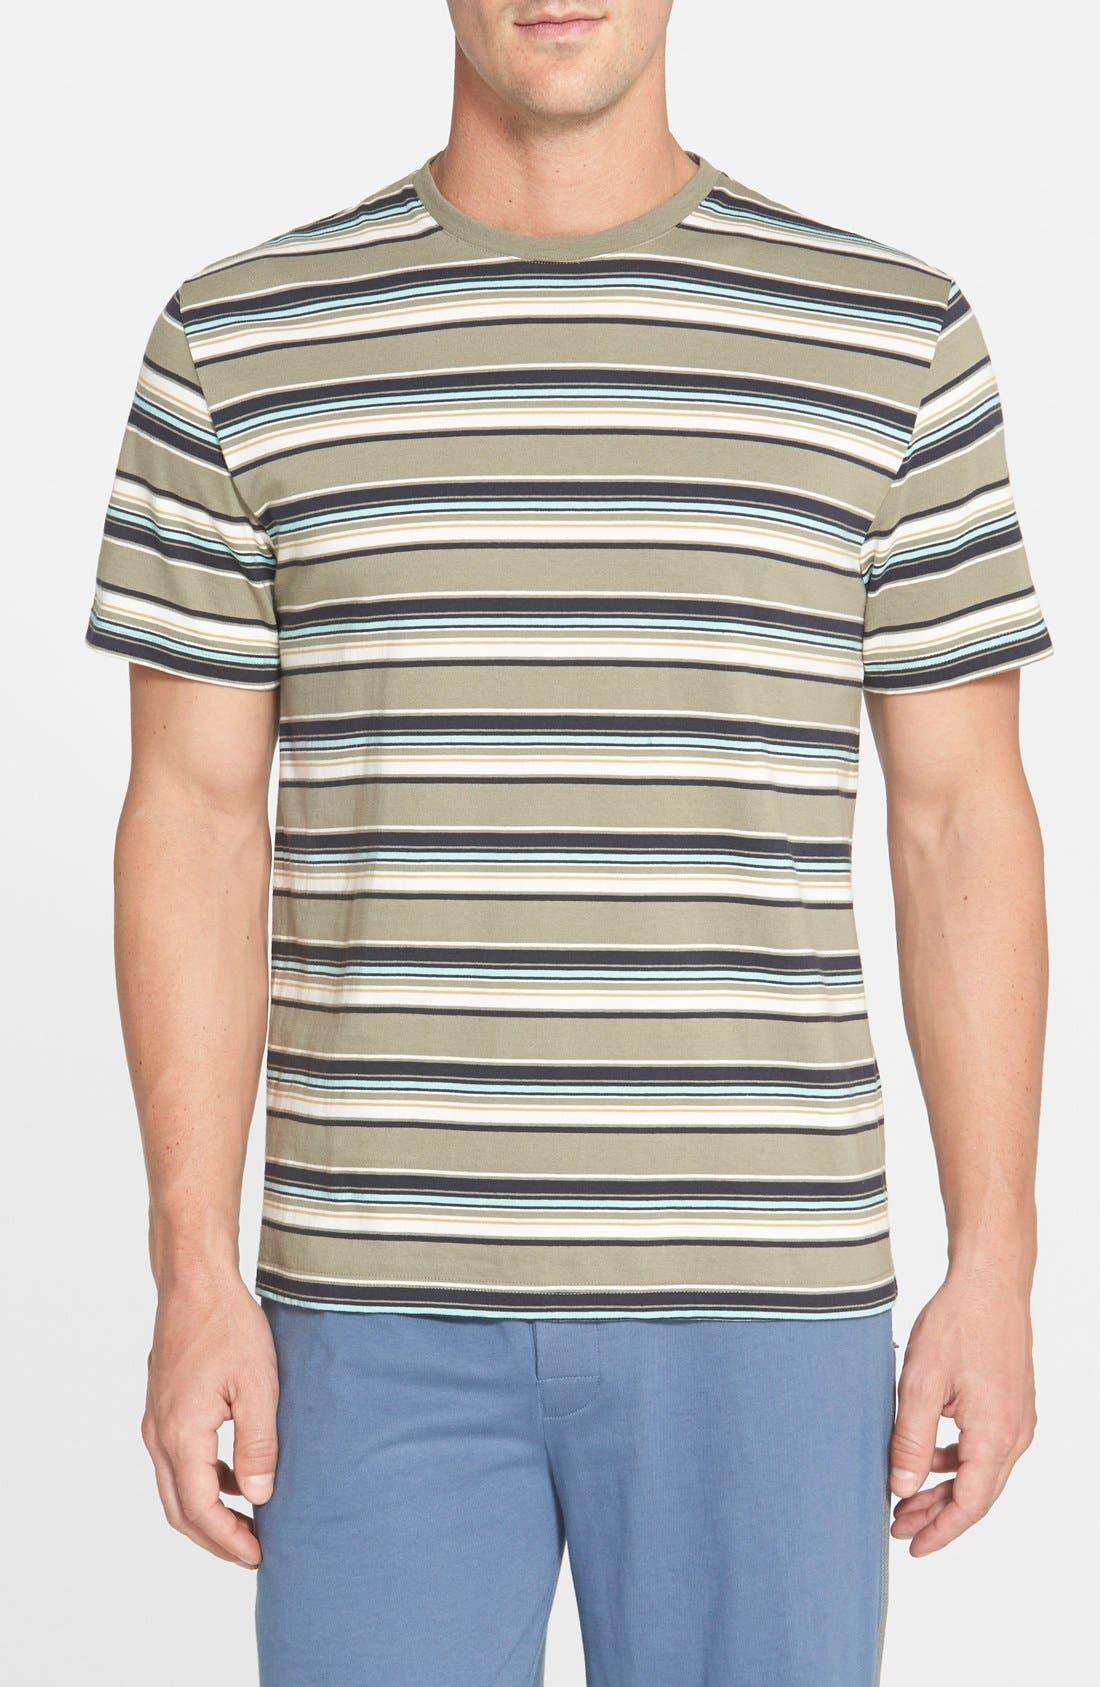 'Greenhouse' Crewneck Cotton T-Shirt,                             Main thumbnail 1, color,                             310